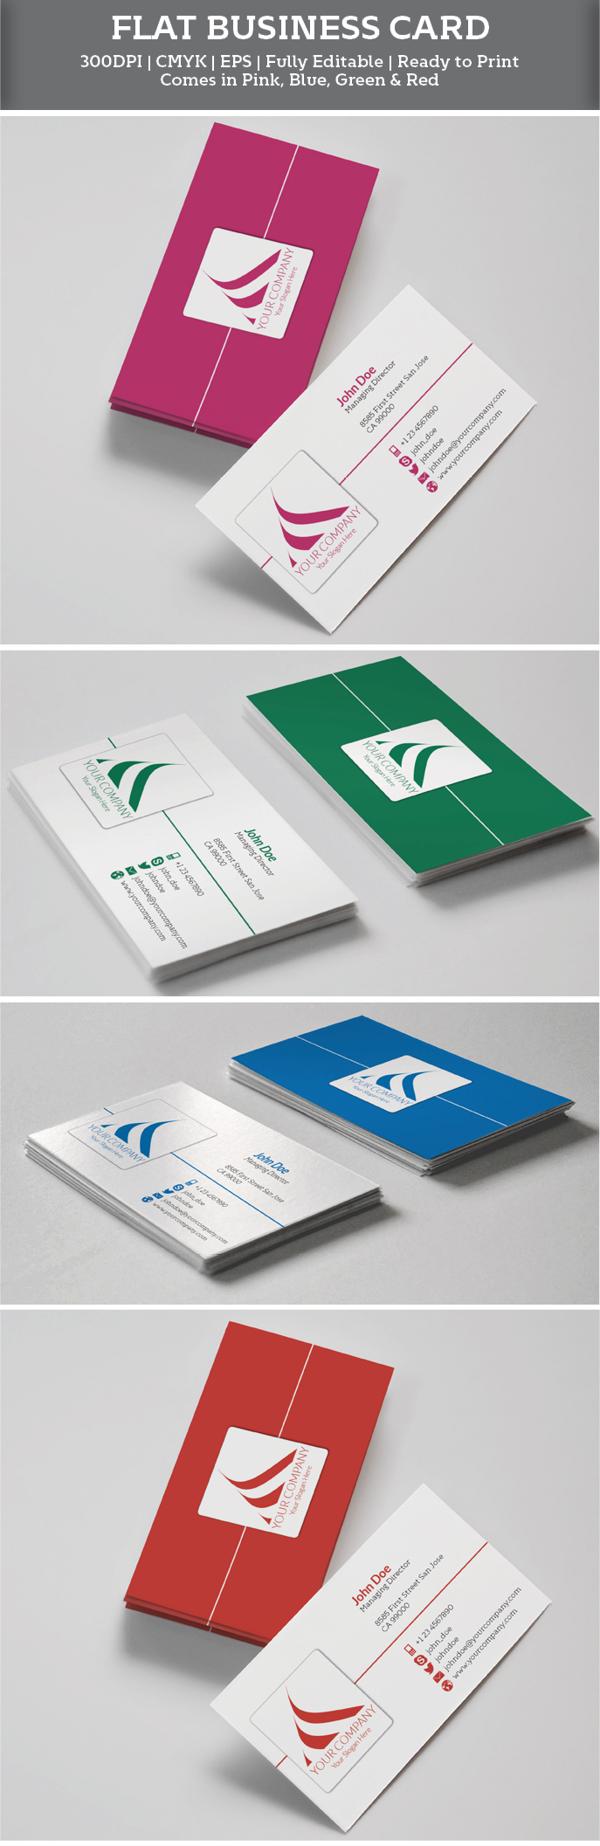 Flat Corporate Business Card Template illustrator Vector 1